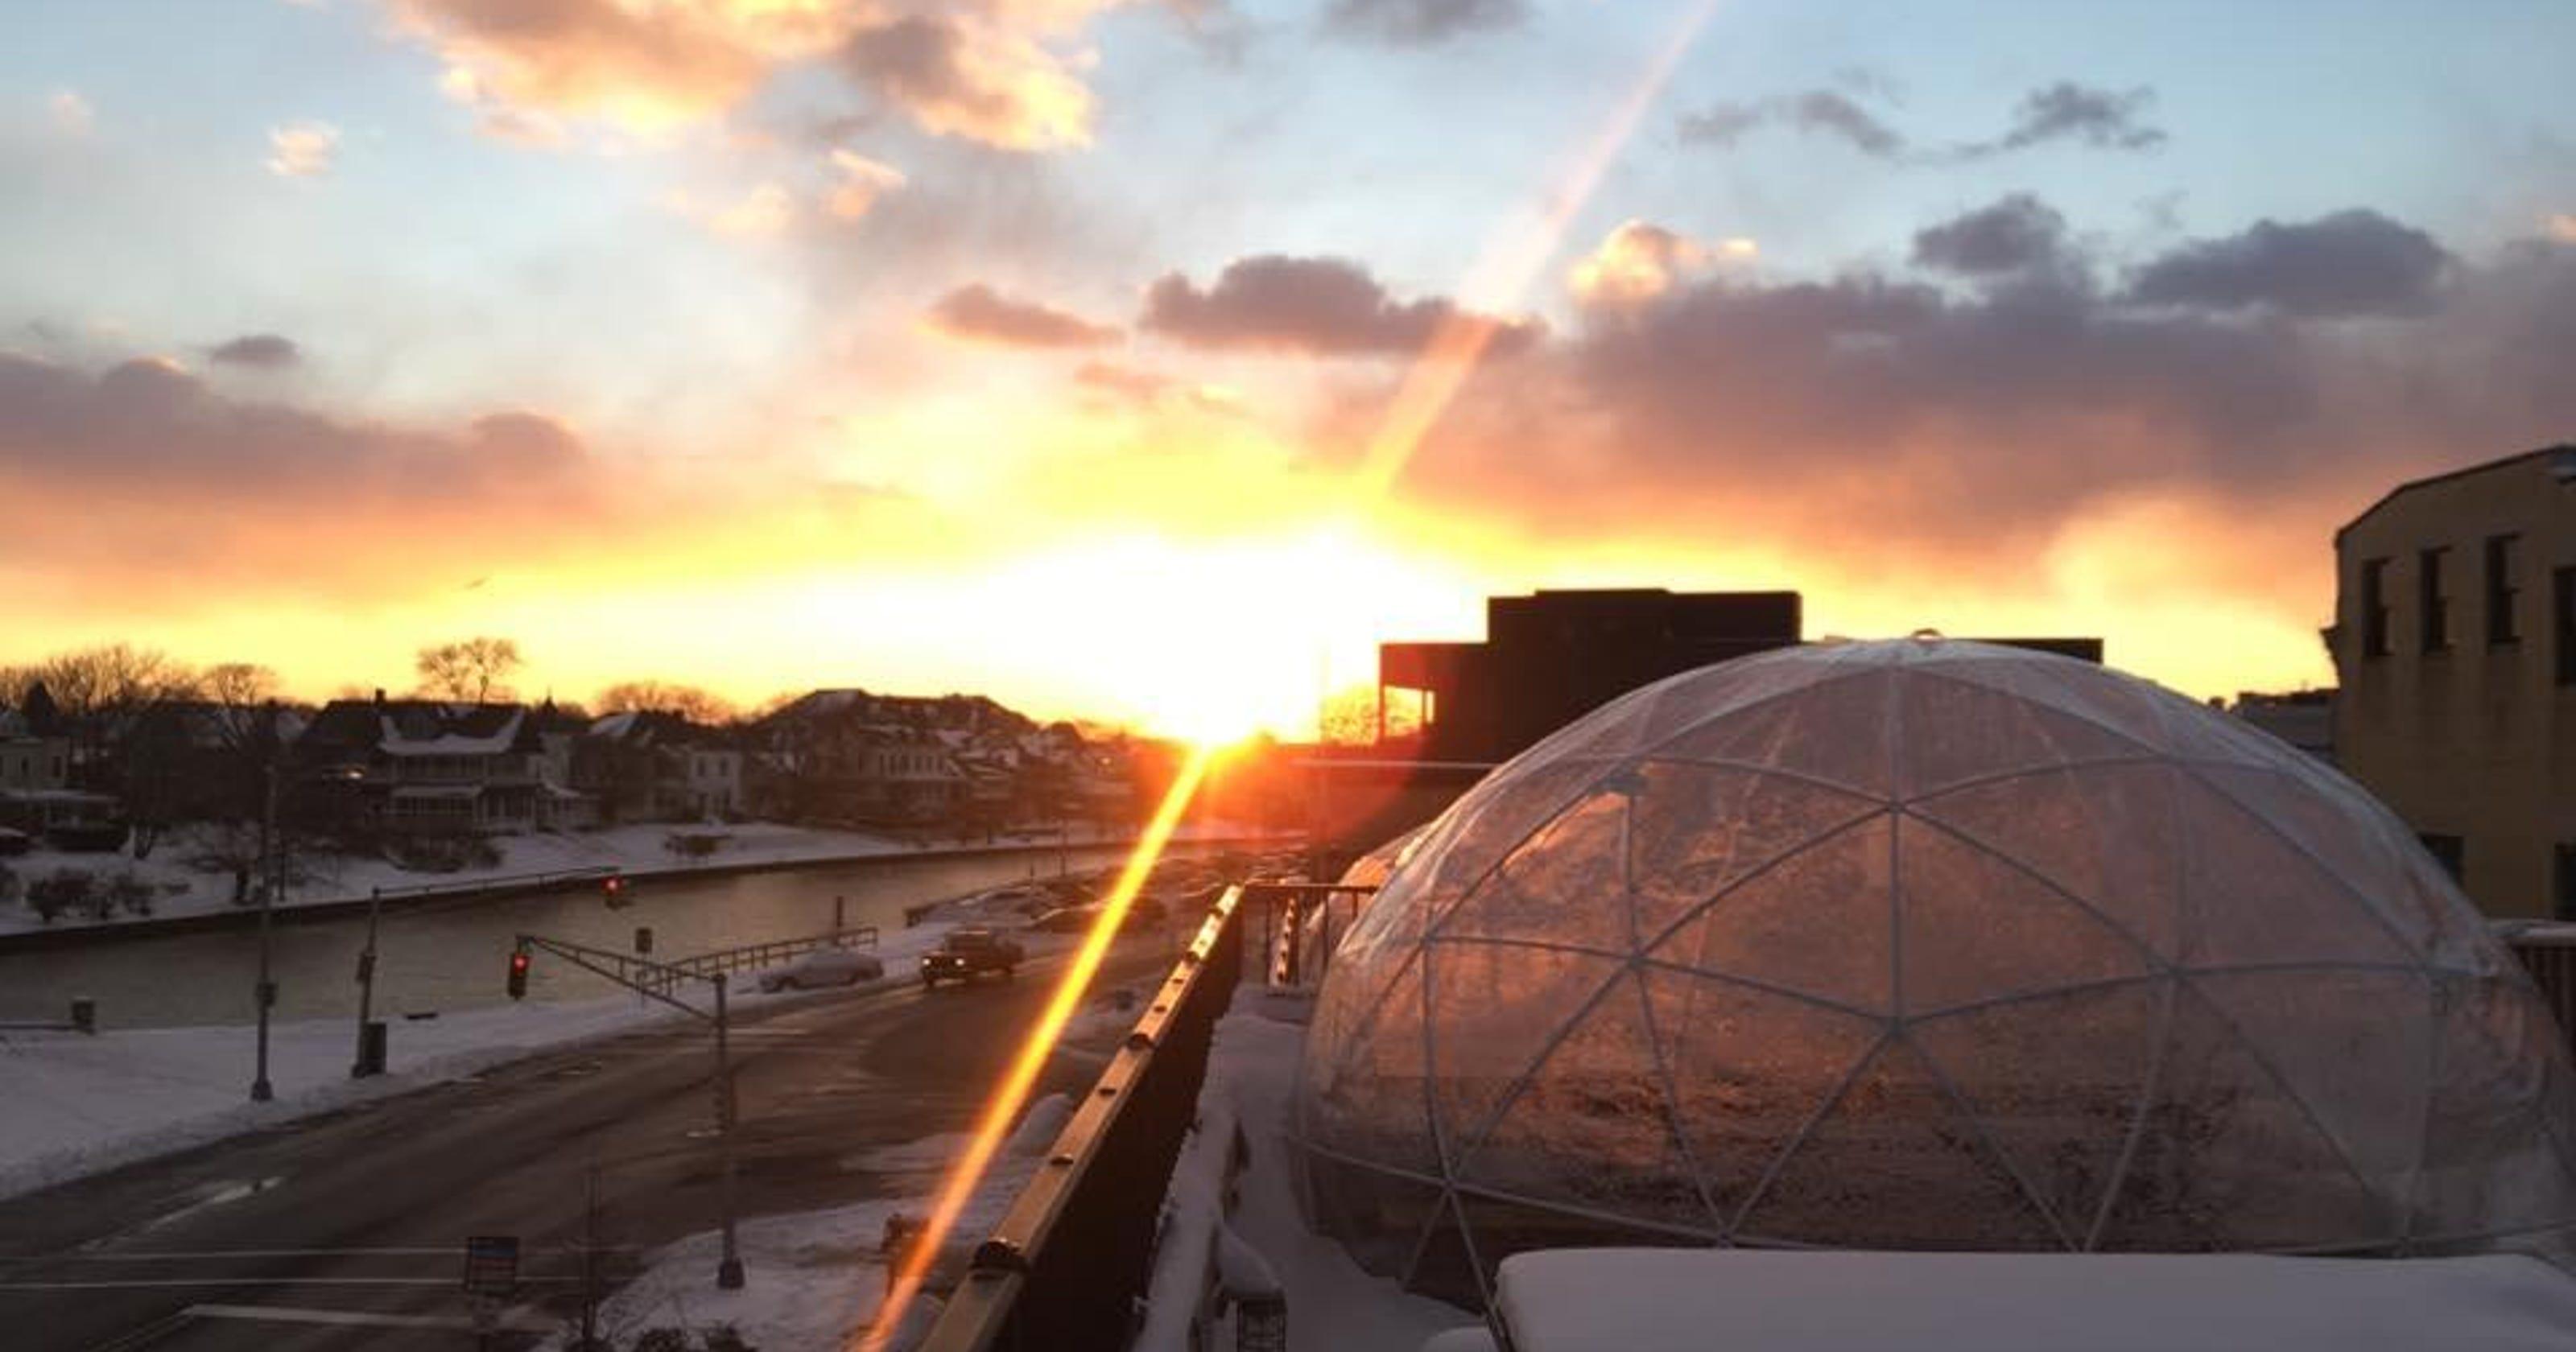 asbury festhalle opens rooftop igloos - Asbury Park Beer Garden